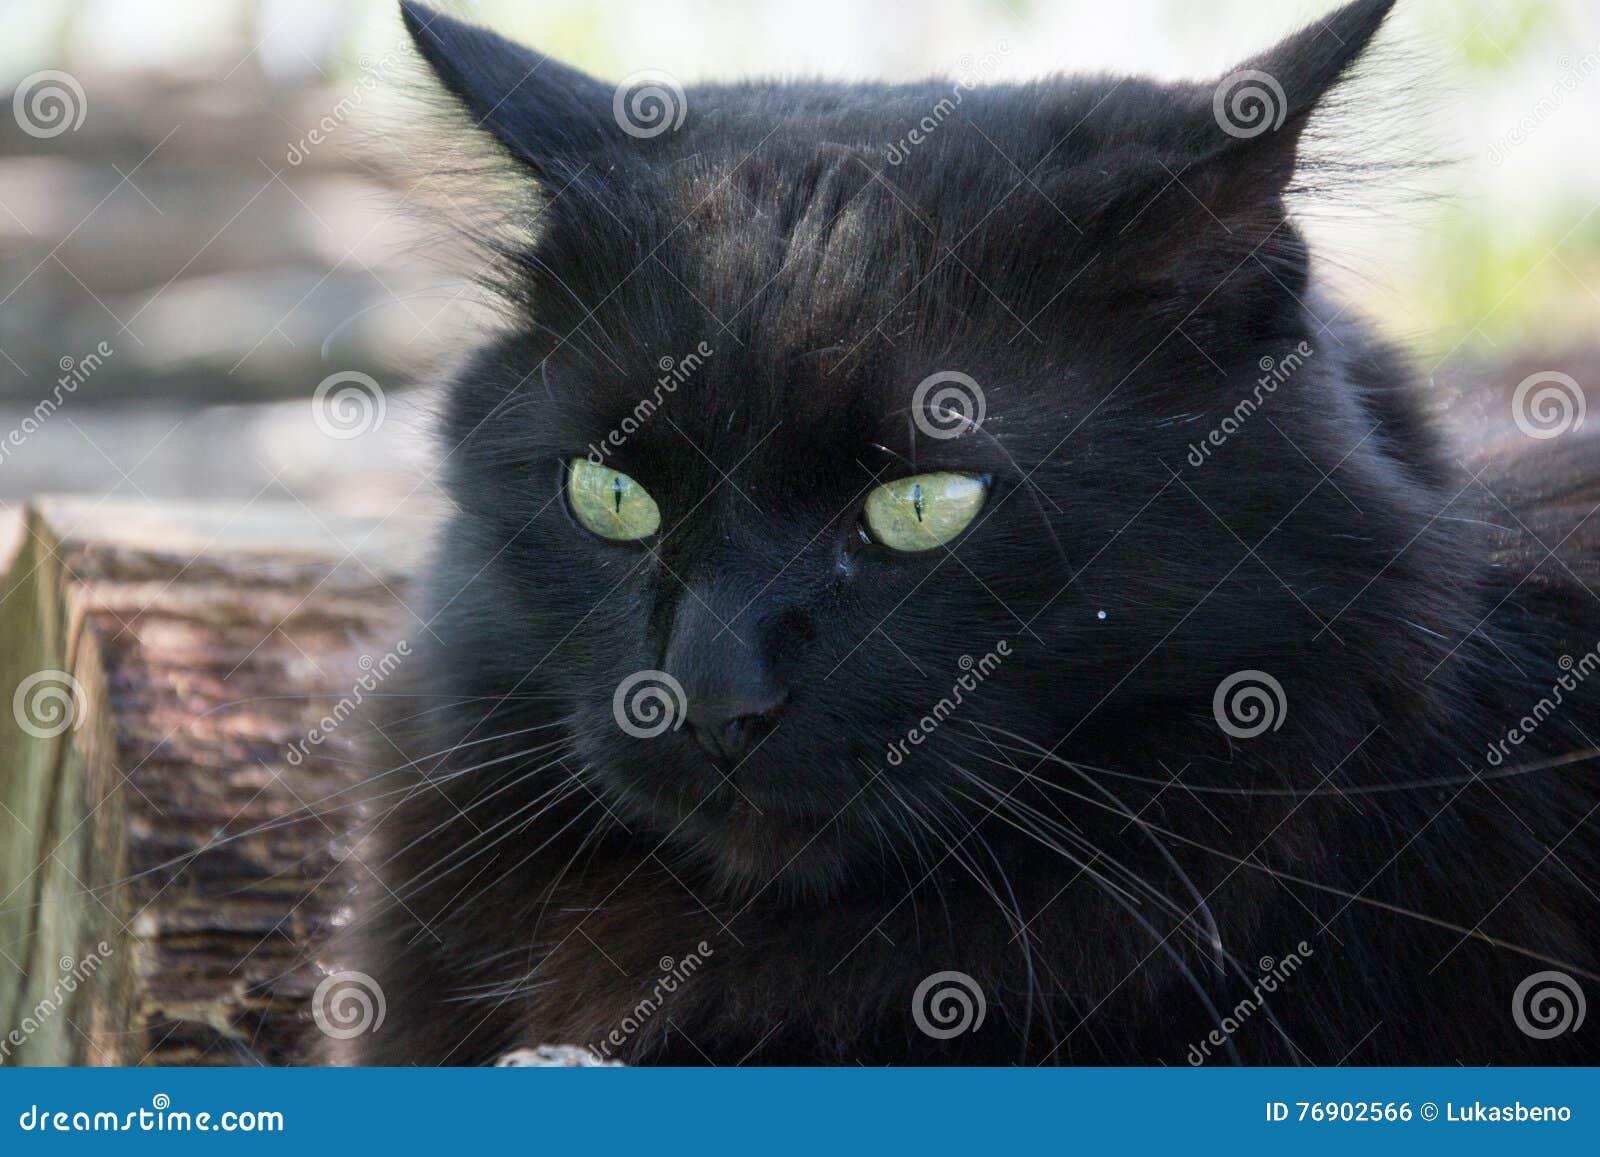 Black Cat Roof Painting